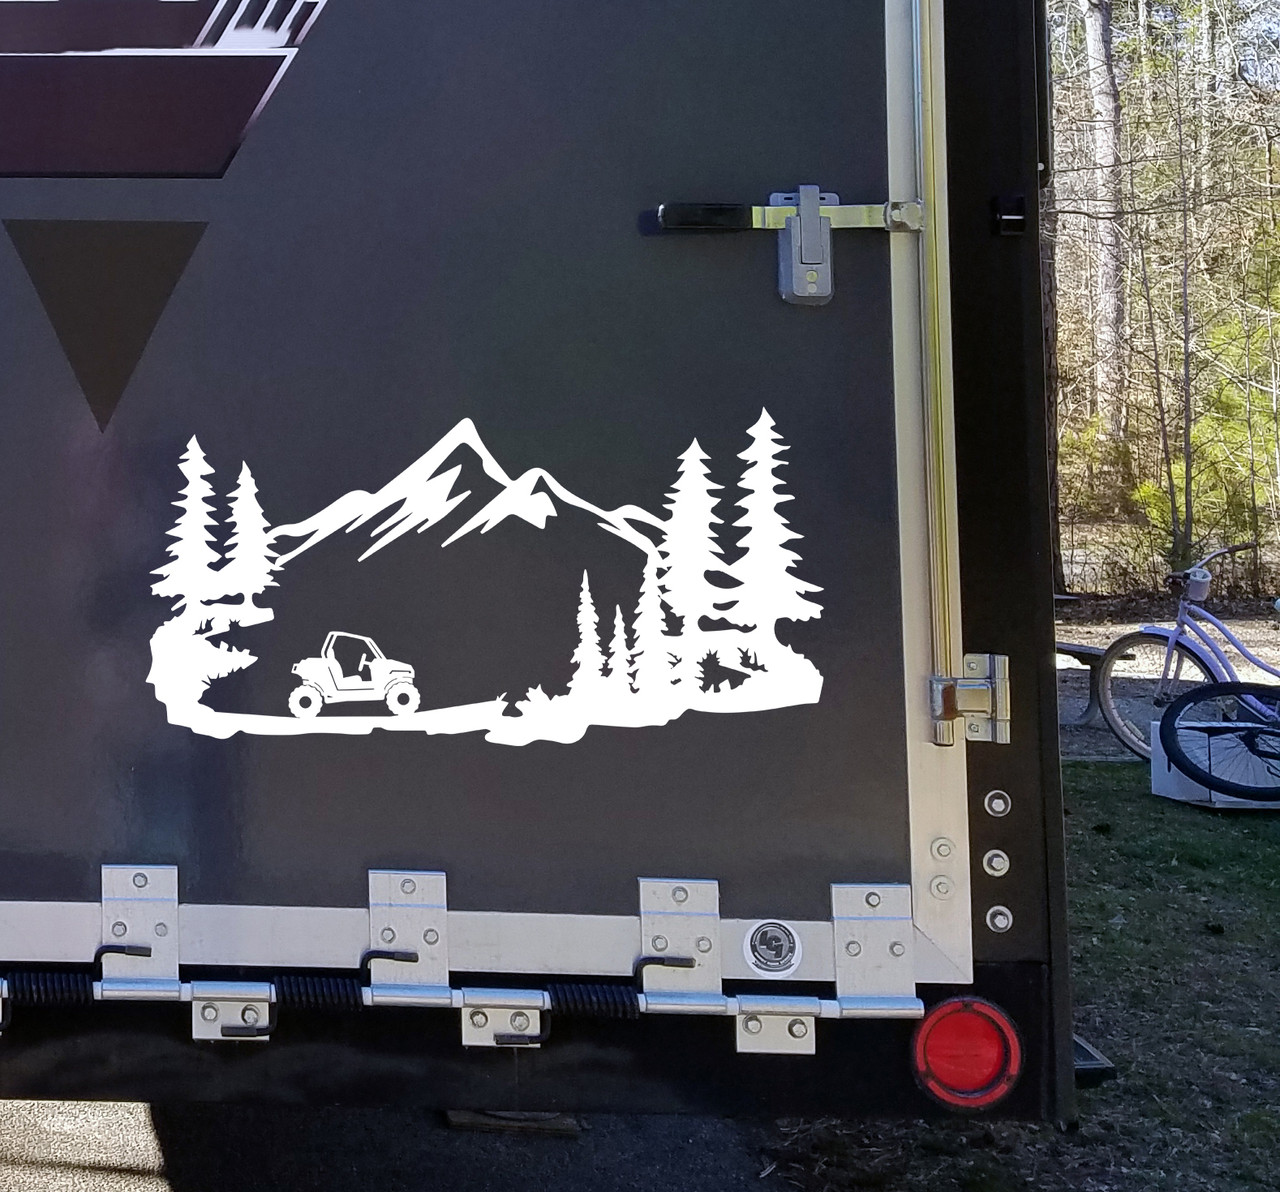 ATV Mountains Scene Vinyl Decal V1 - Quad RV Toy Hauler Graphics 4-wheeler  - Die Cut Sticker